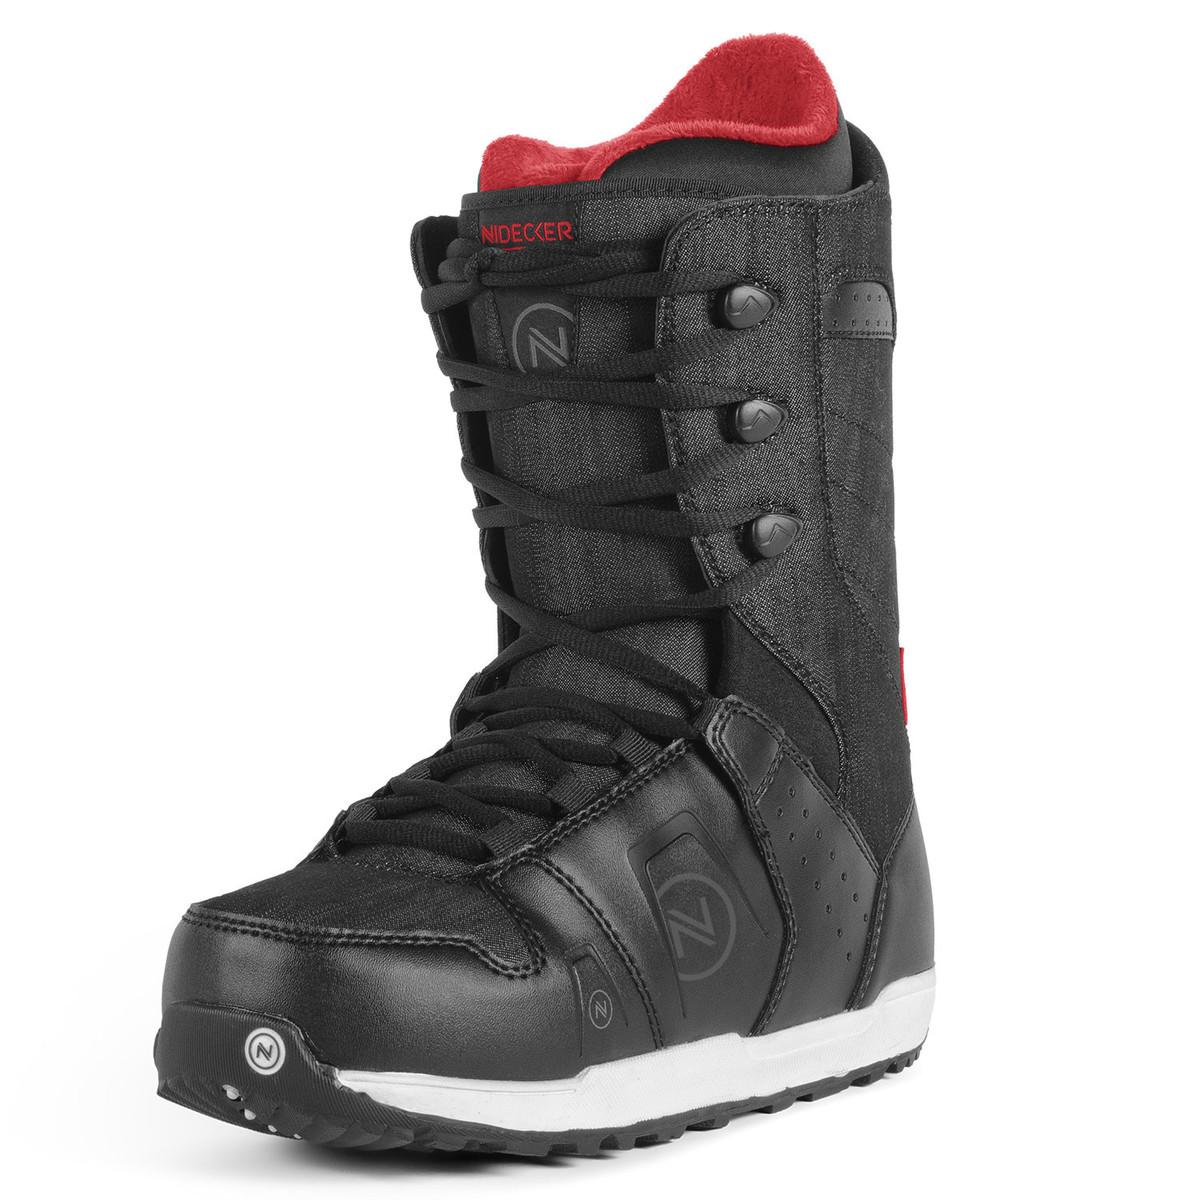 Snowboardové boty Nidecker Charger 17/18 11 (46)